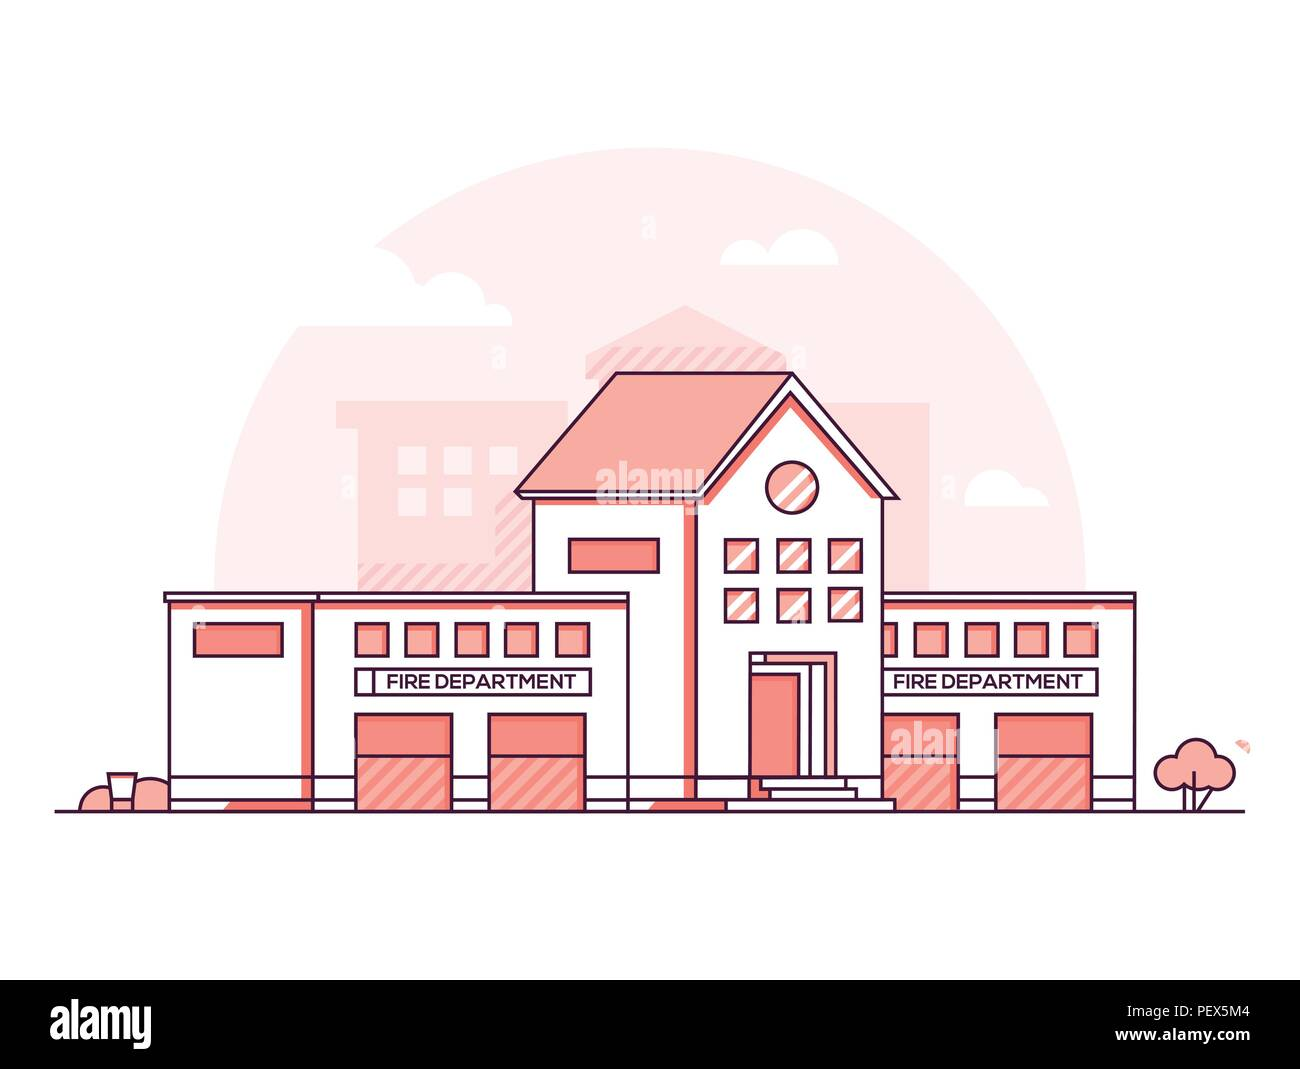 Fire department modern thin line design style vector illustration